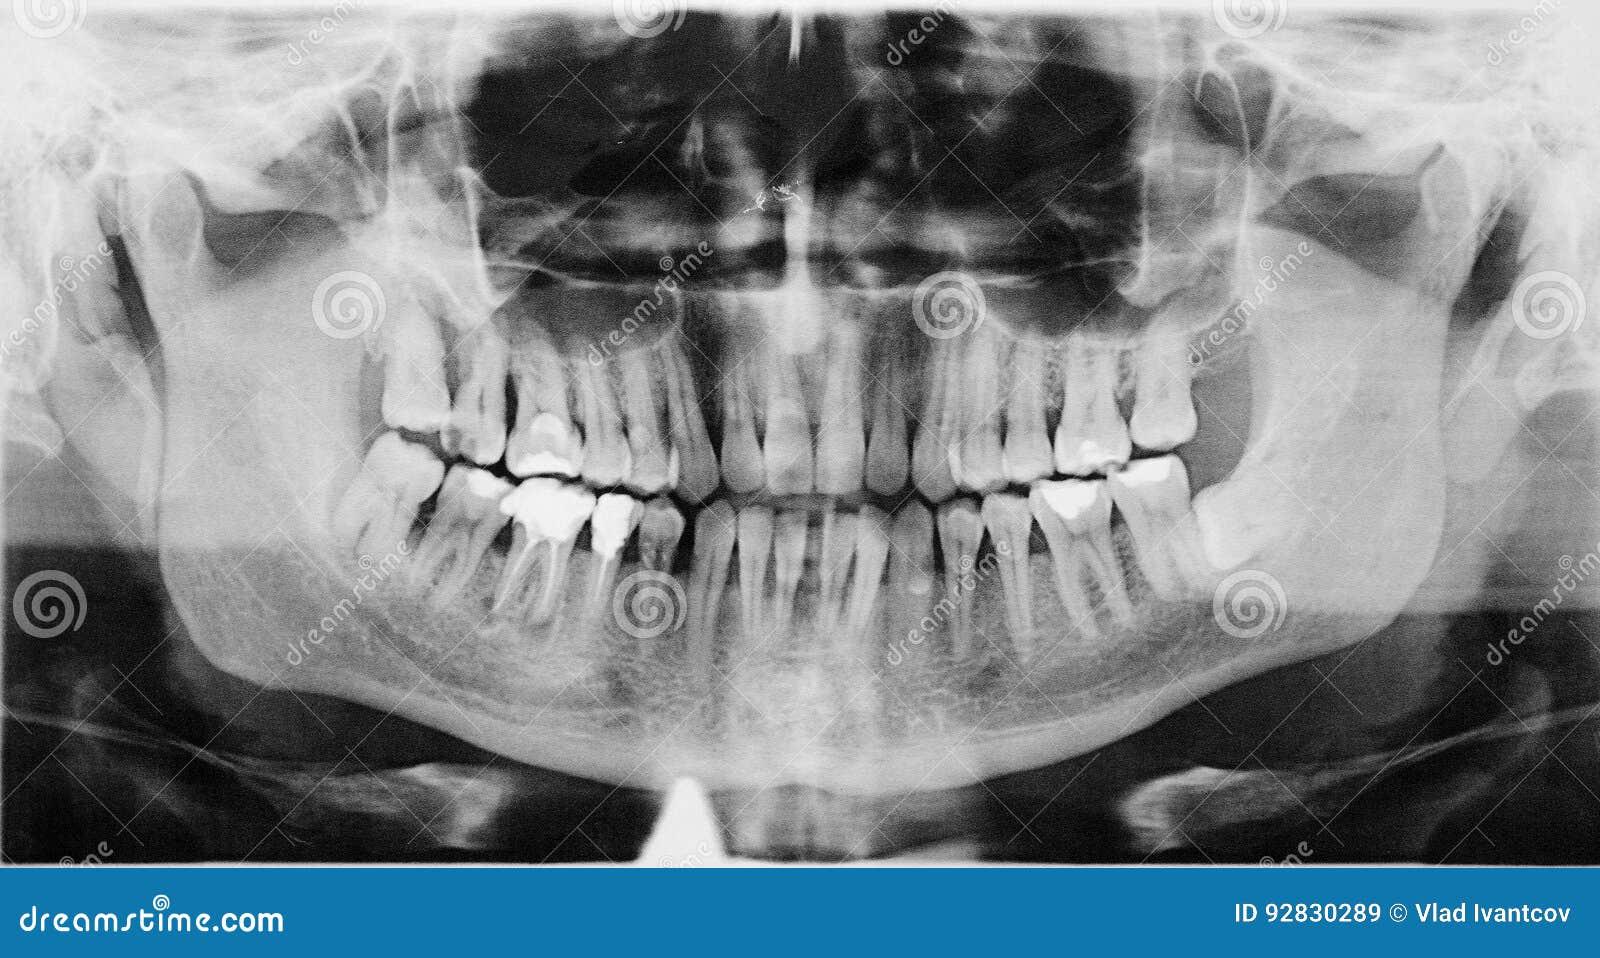 Panoramic dental X-Ray. stock image. Image of anatomy - 92830289